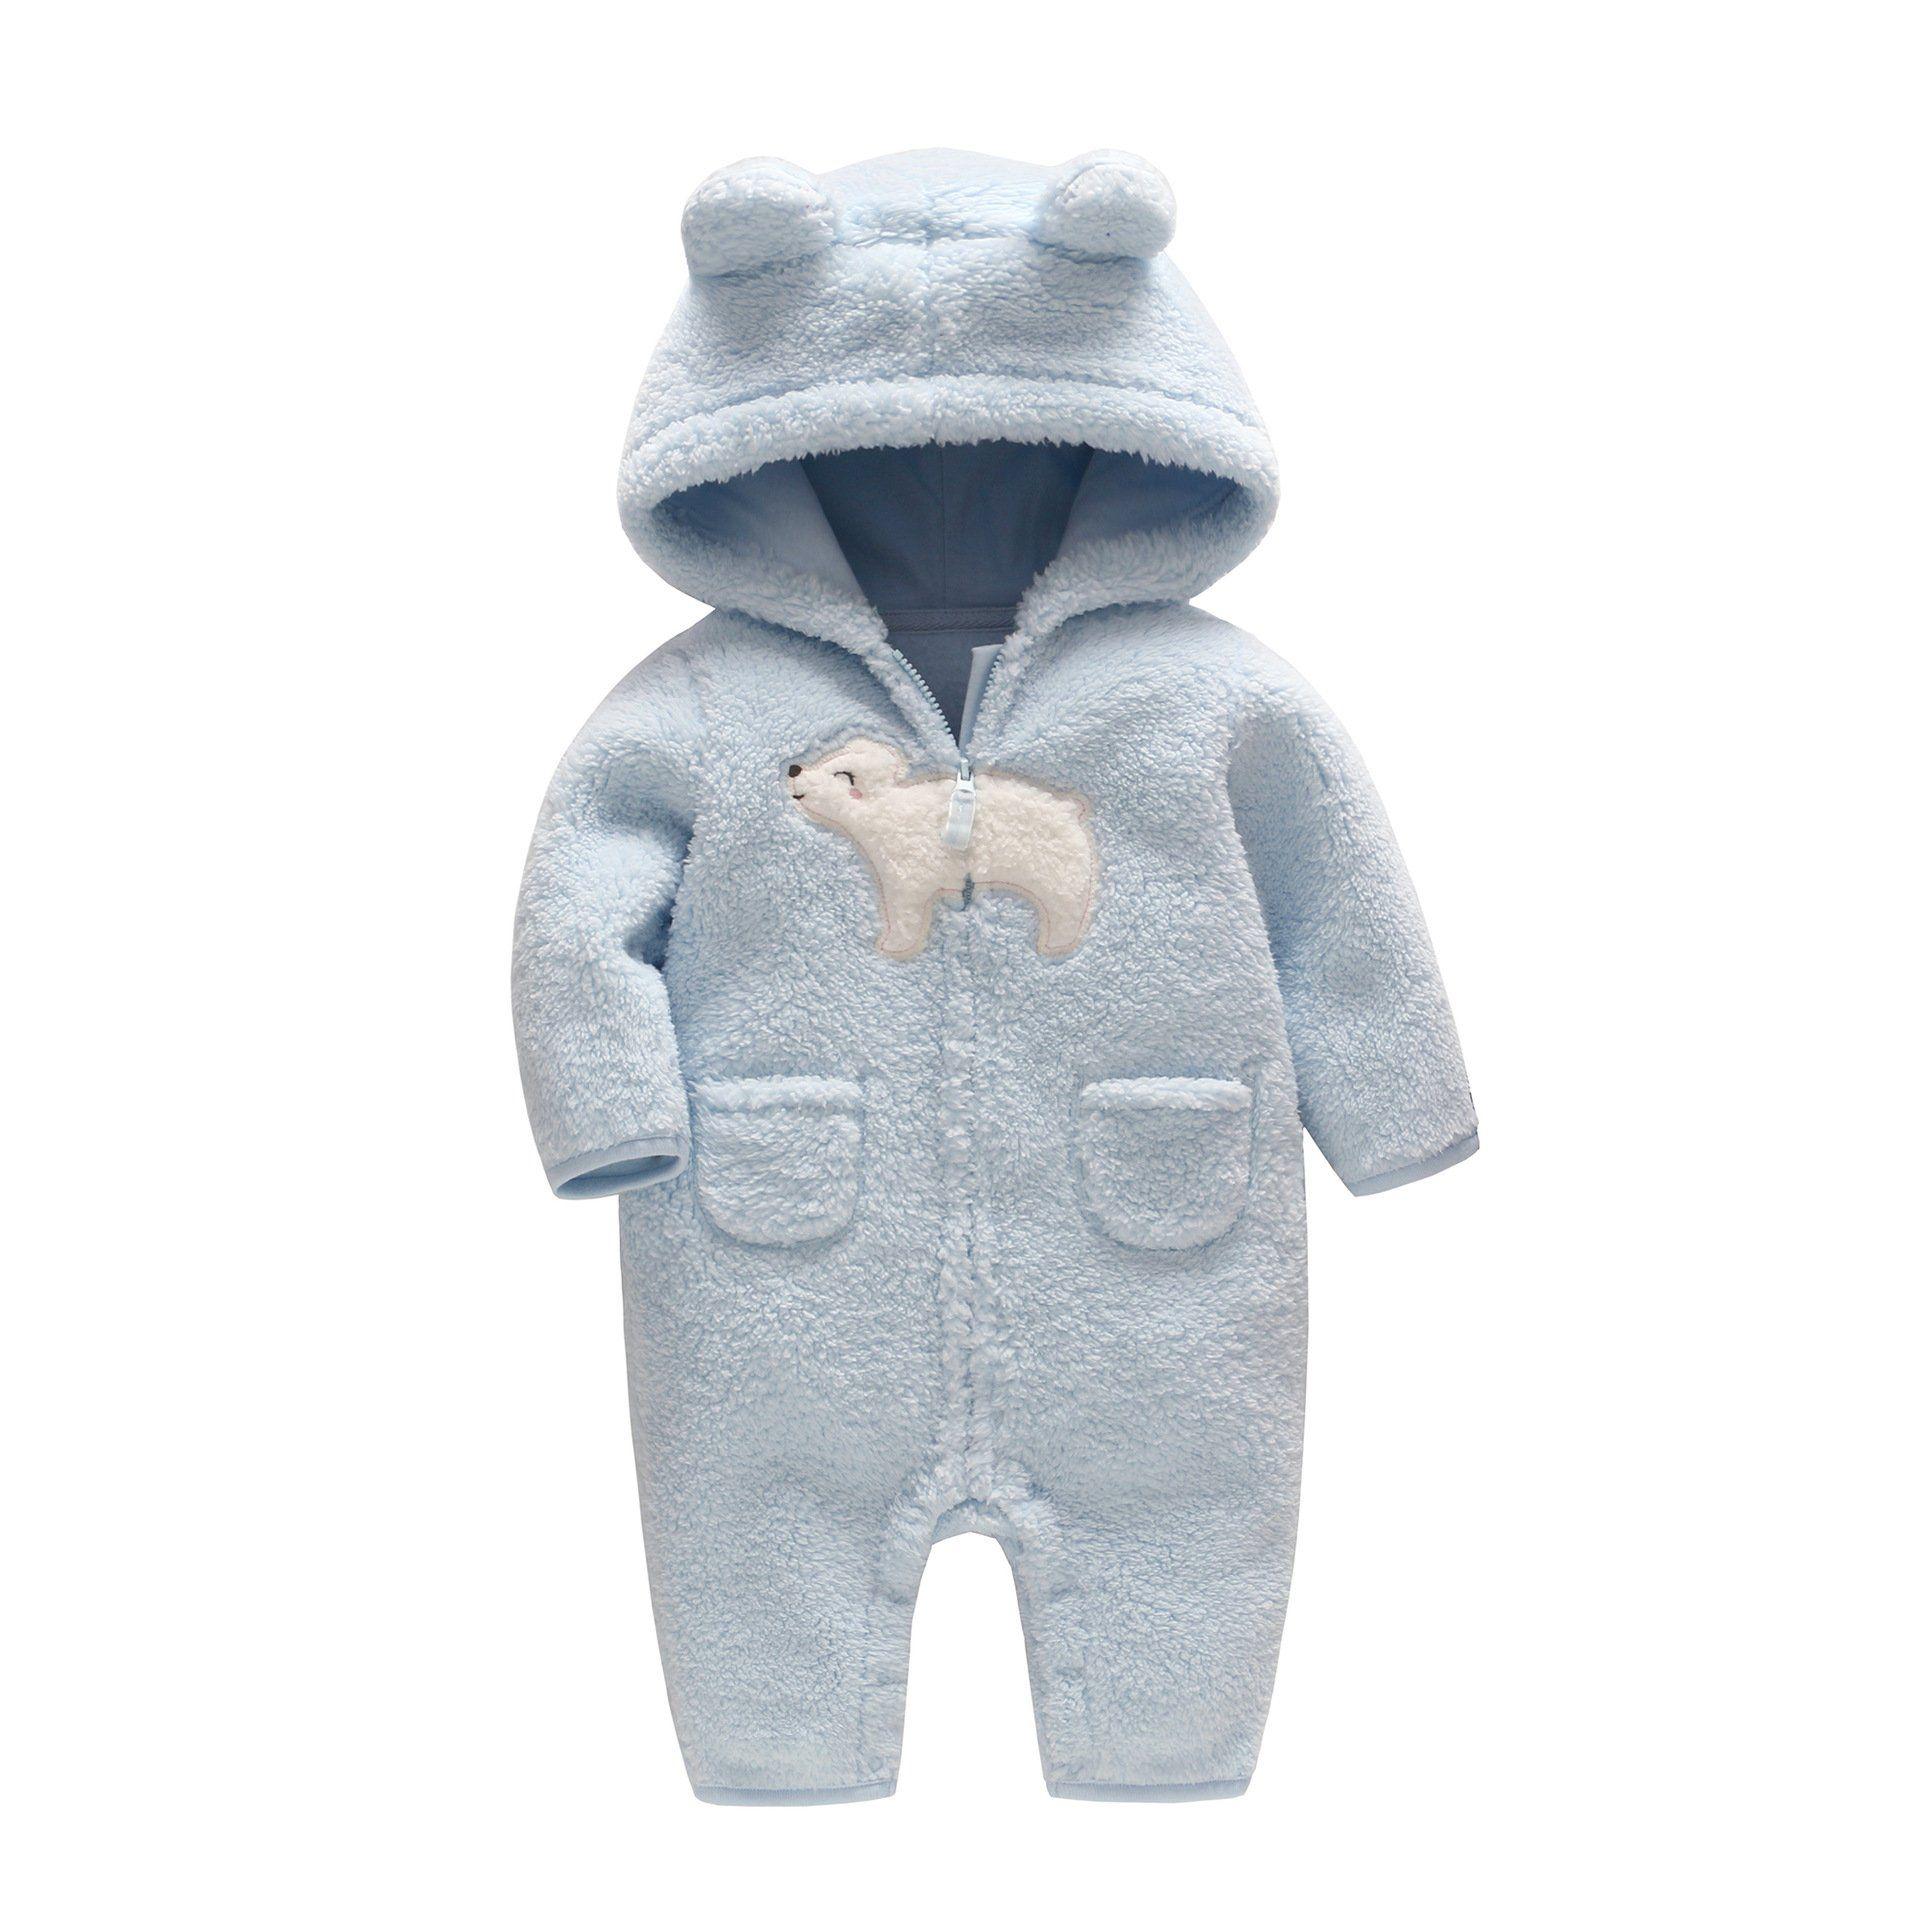 ccbc33c93 Cartoon Polar Bear Cashmere Baby Winter Warm Hooded Jumpsuit ...